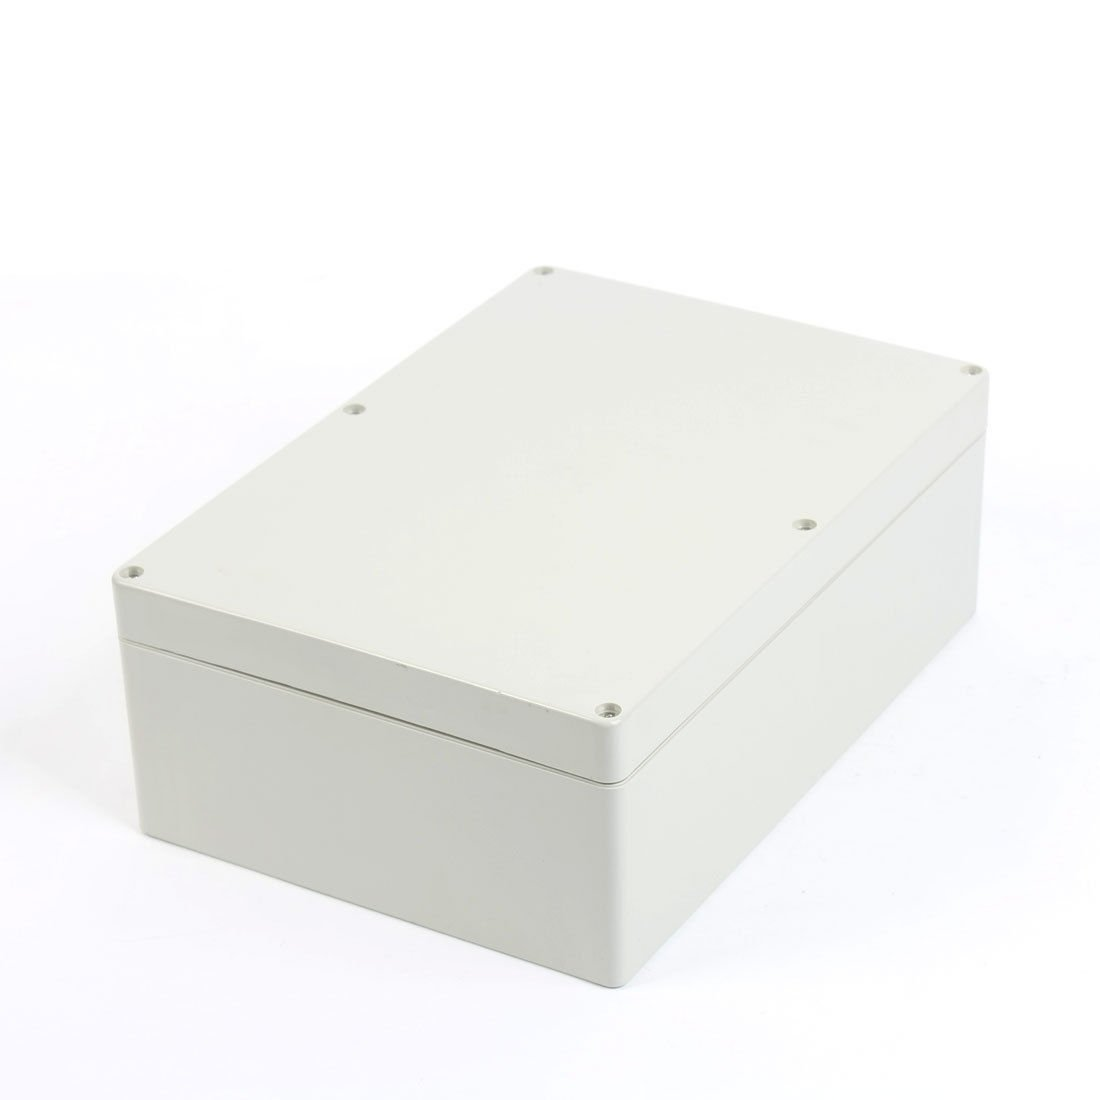 265mmx185mmx95mm Waterproof Plastic Enclosure Case Power Junction Box